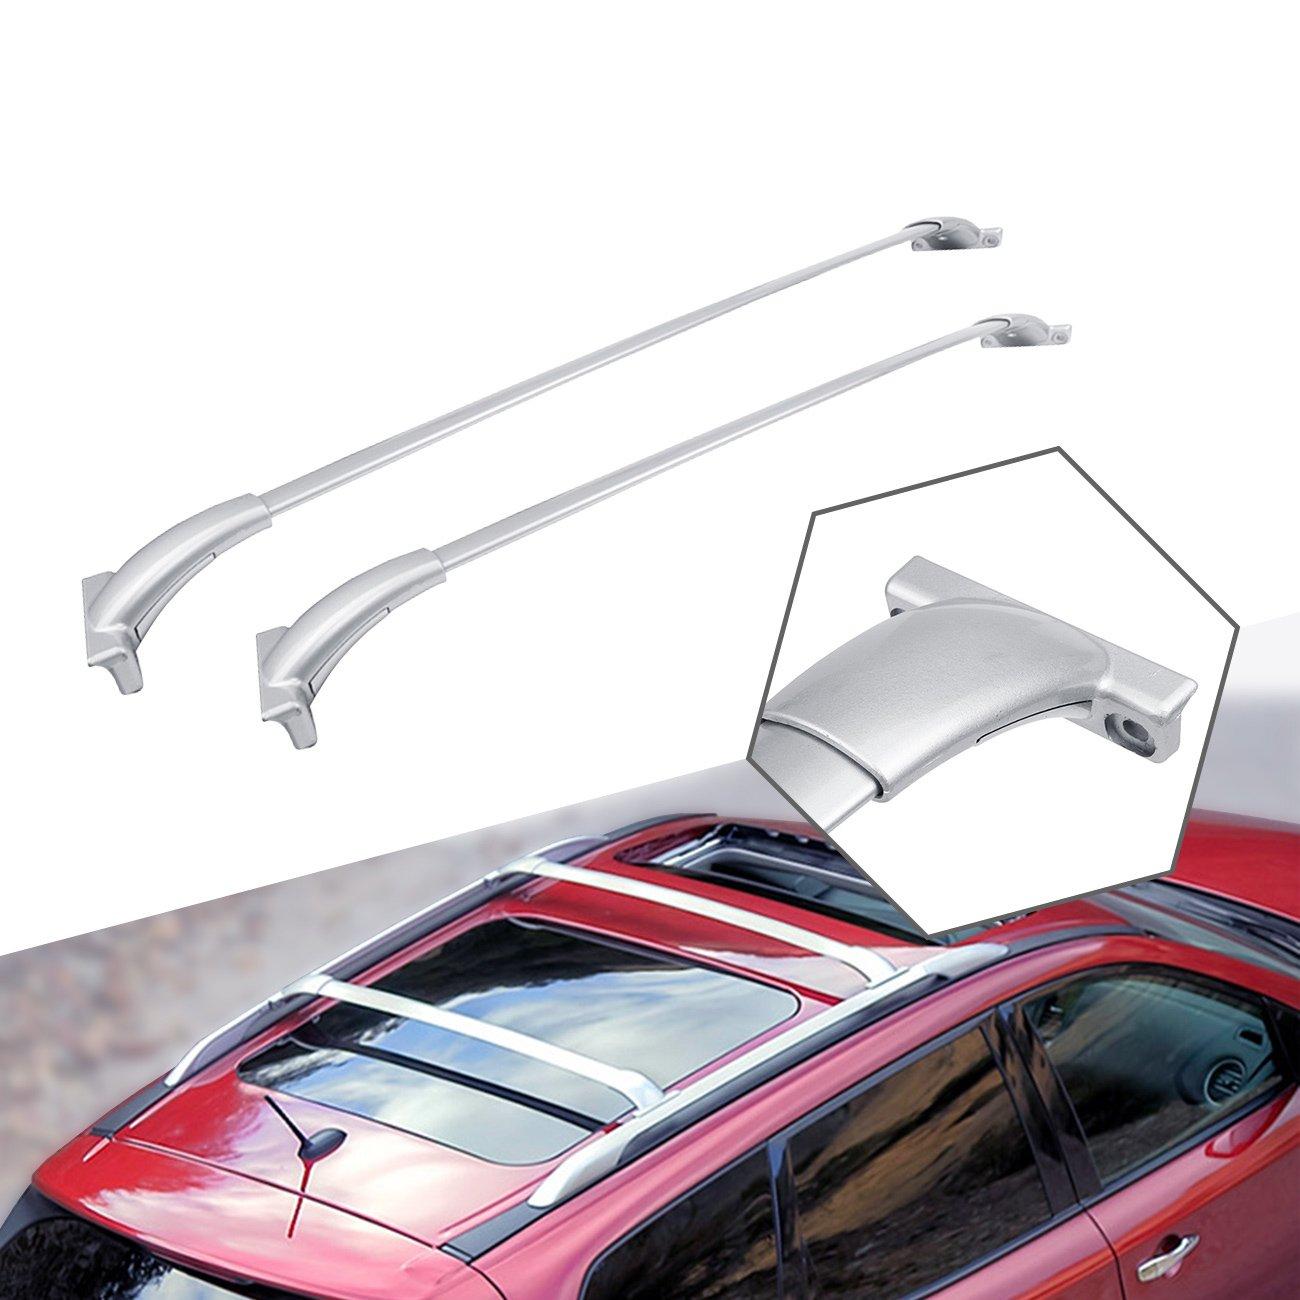 ALAVENTE Roof Rack Cross Bars for 2013-2017 Nissan Pathfinder Crossbar Roof Top Rail Rack (Silver)